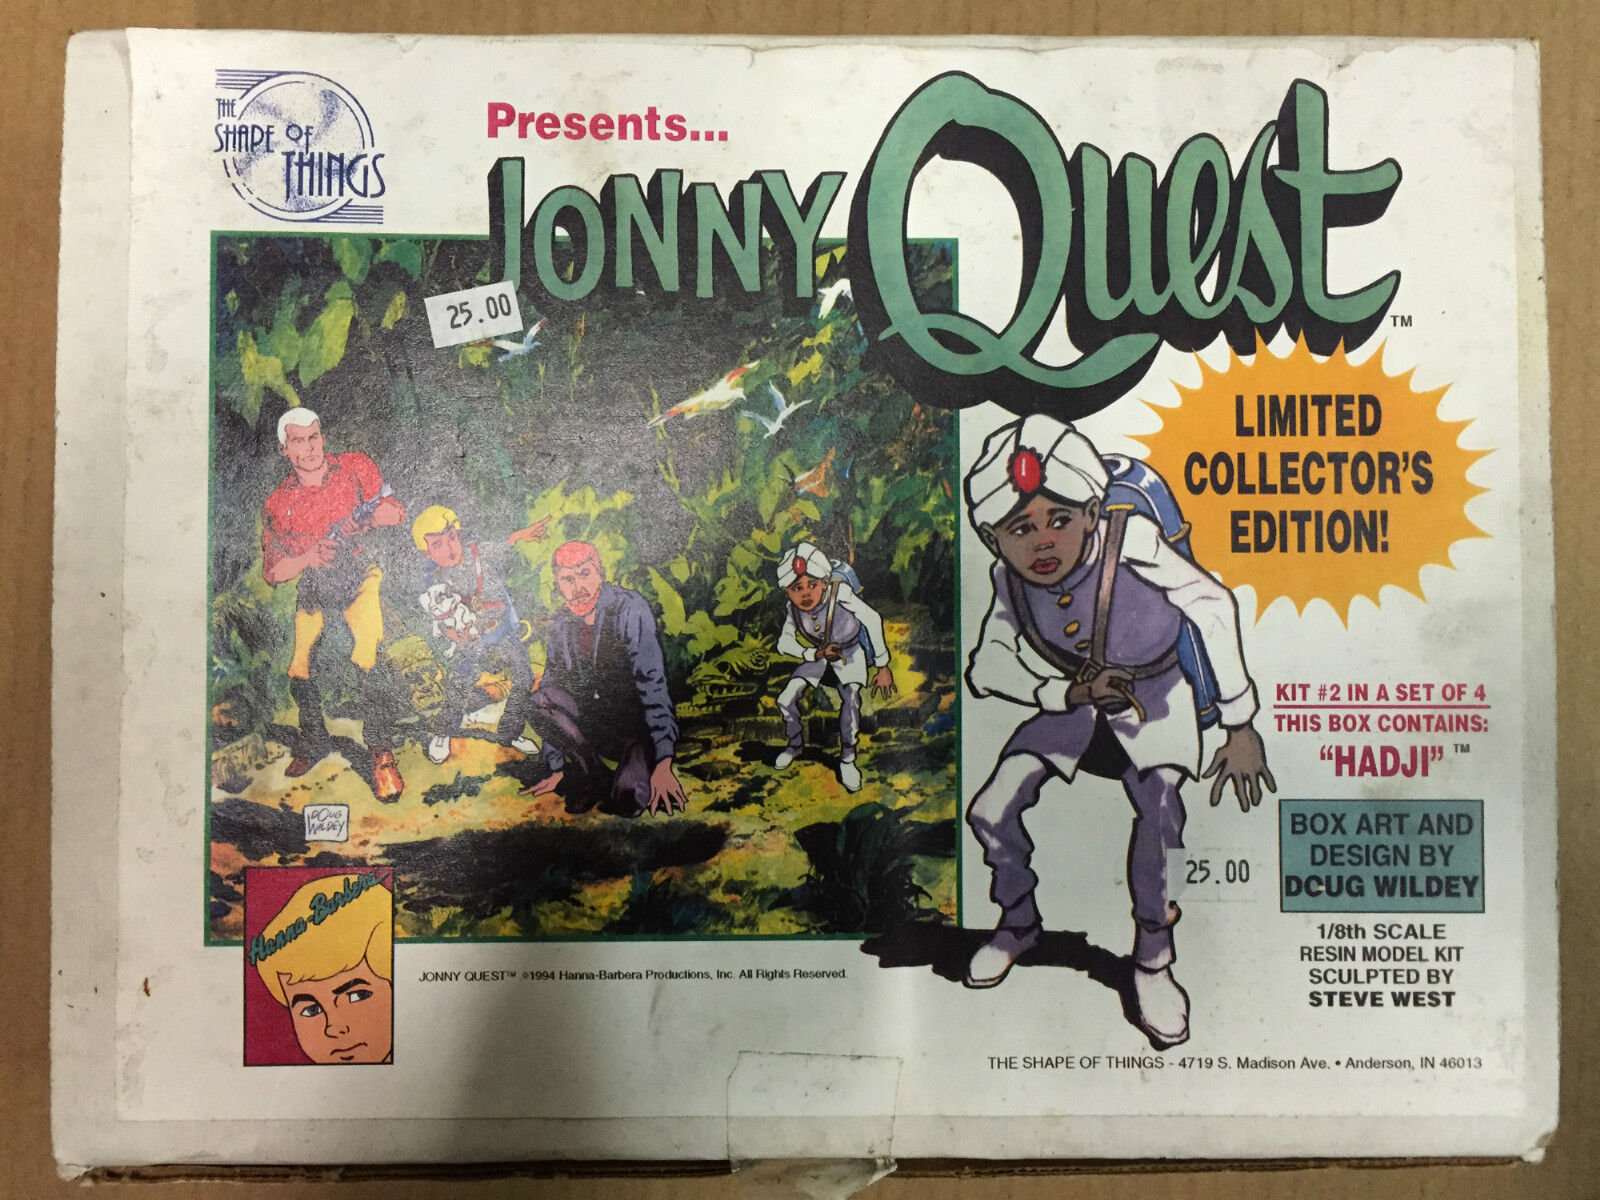 Jonny Quest Hadji Coldcast 1 8th scale the shape of things Model Kit 1994